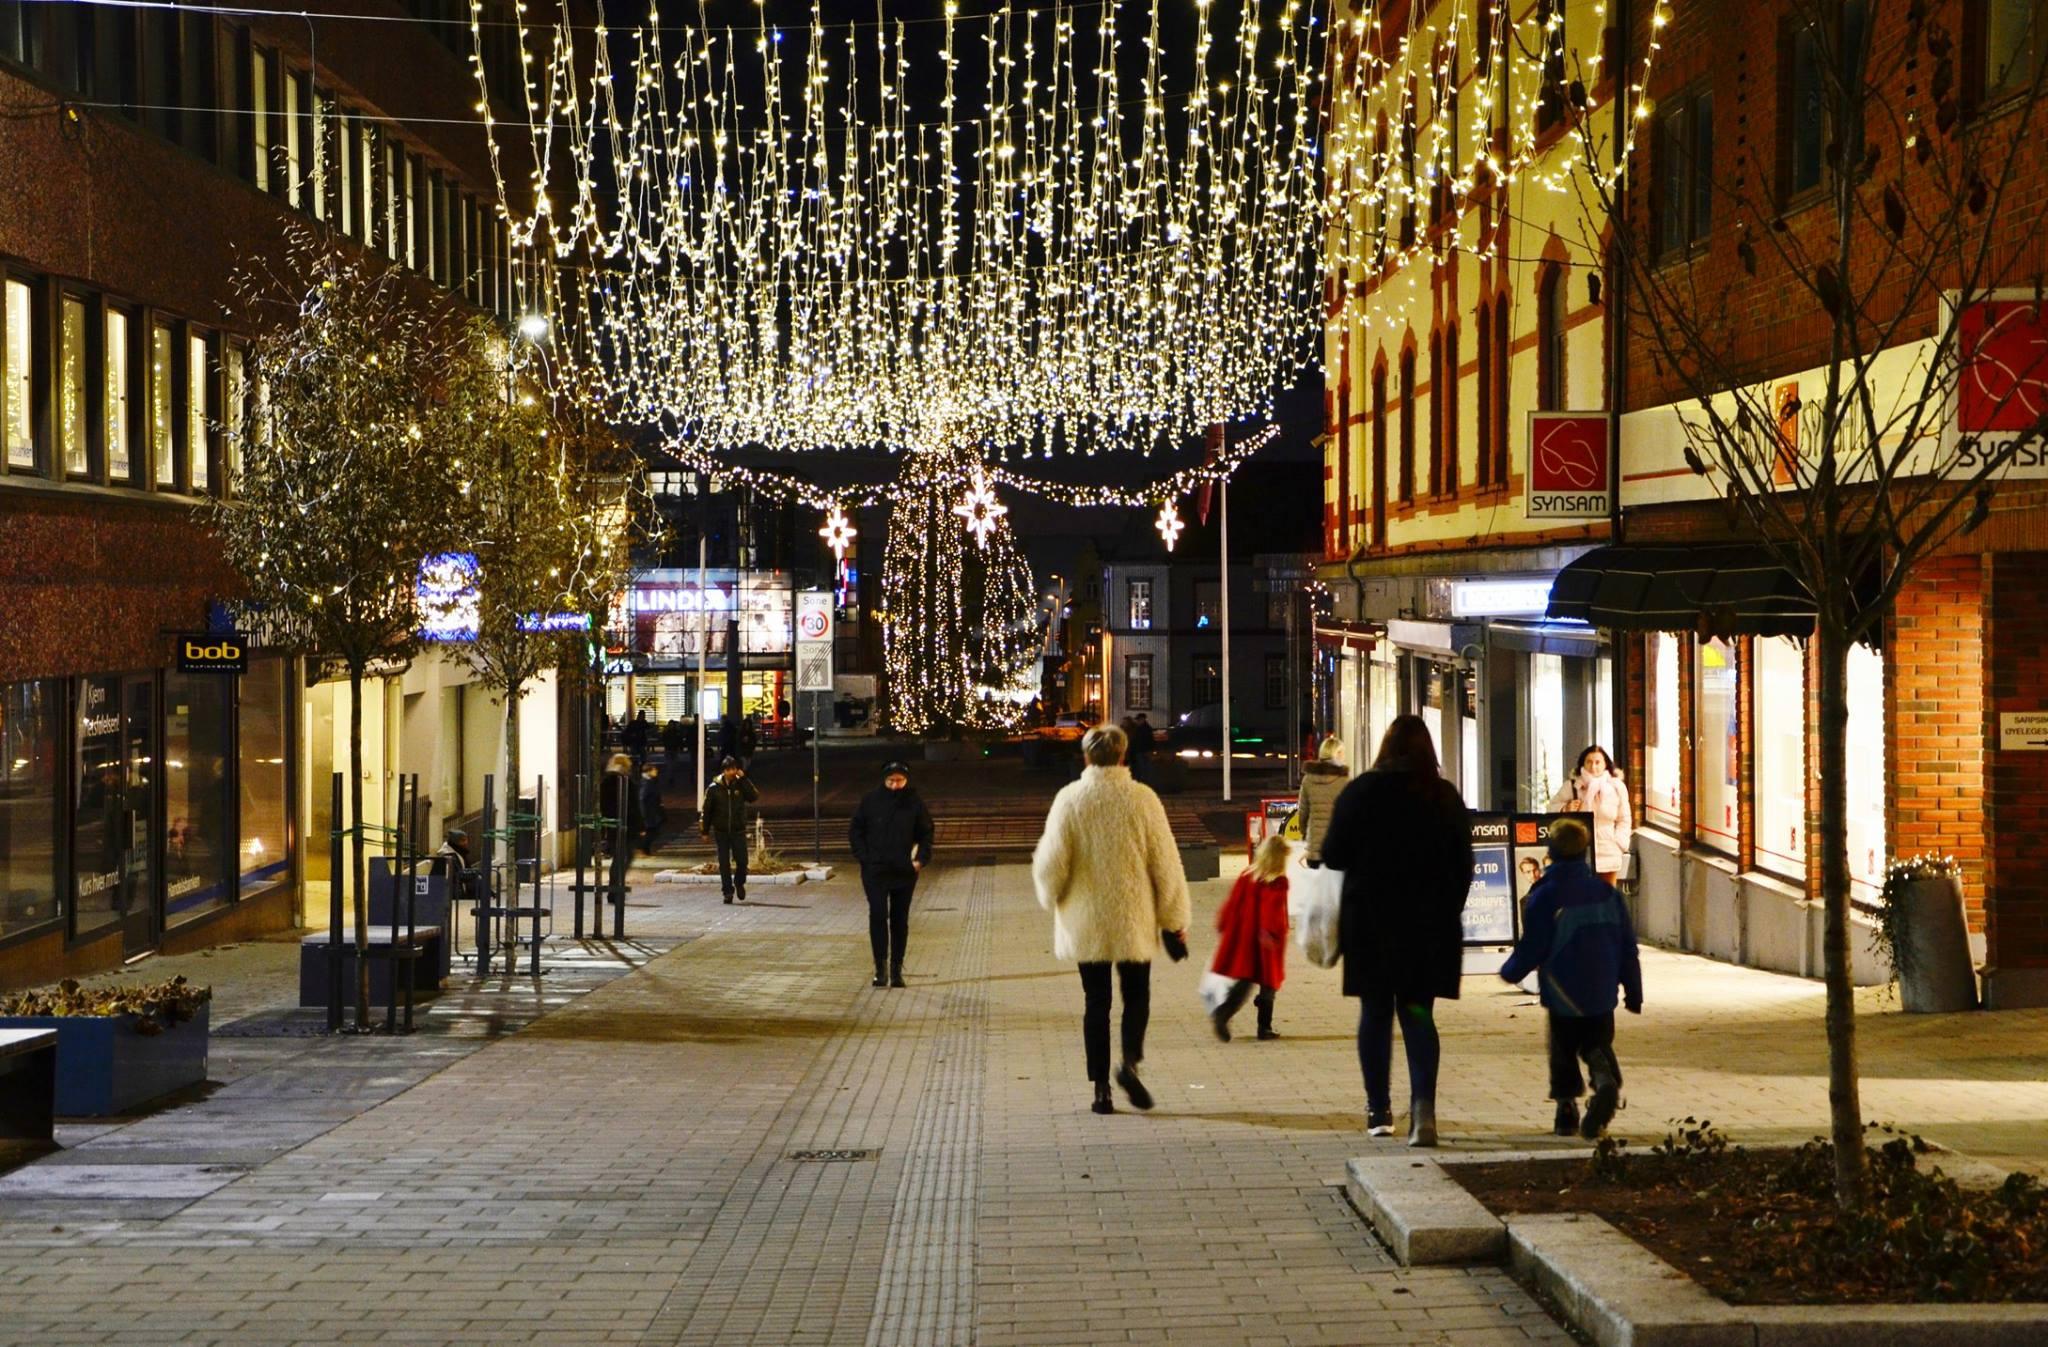 jul lys gate